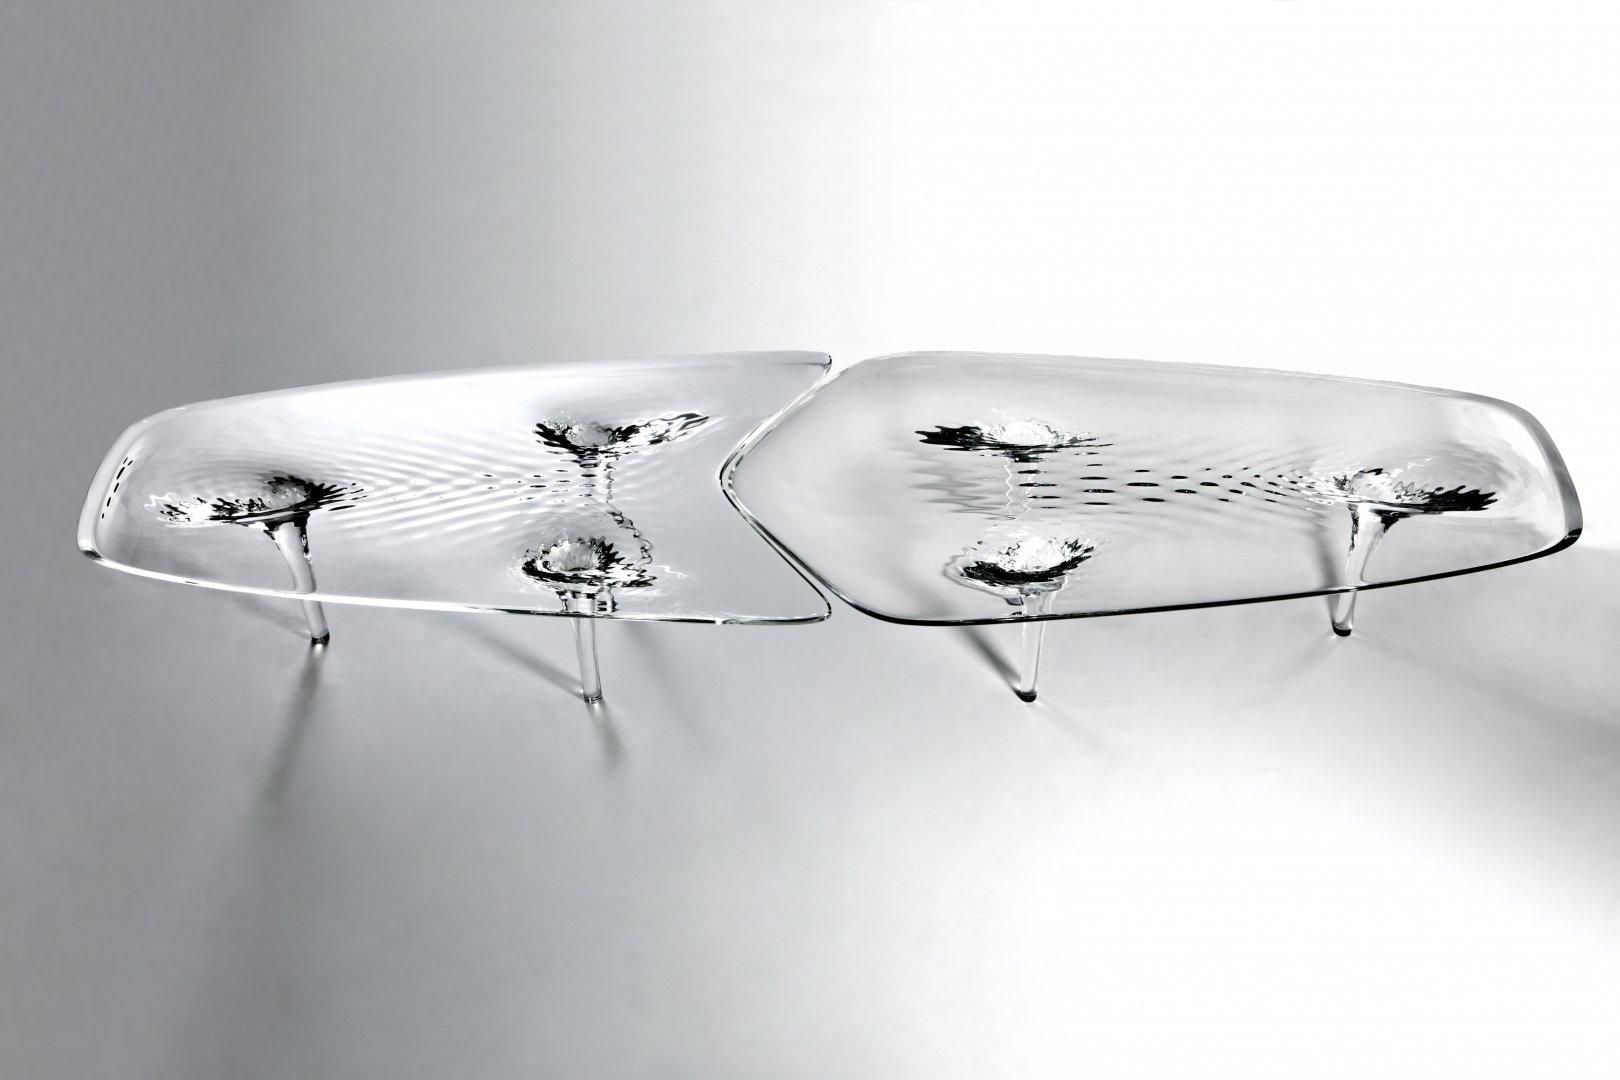 Jacopo Spilimbergo. | Zaha Hadid Architects.